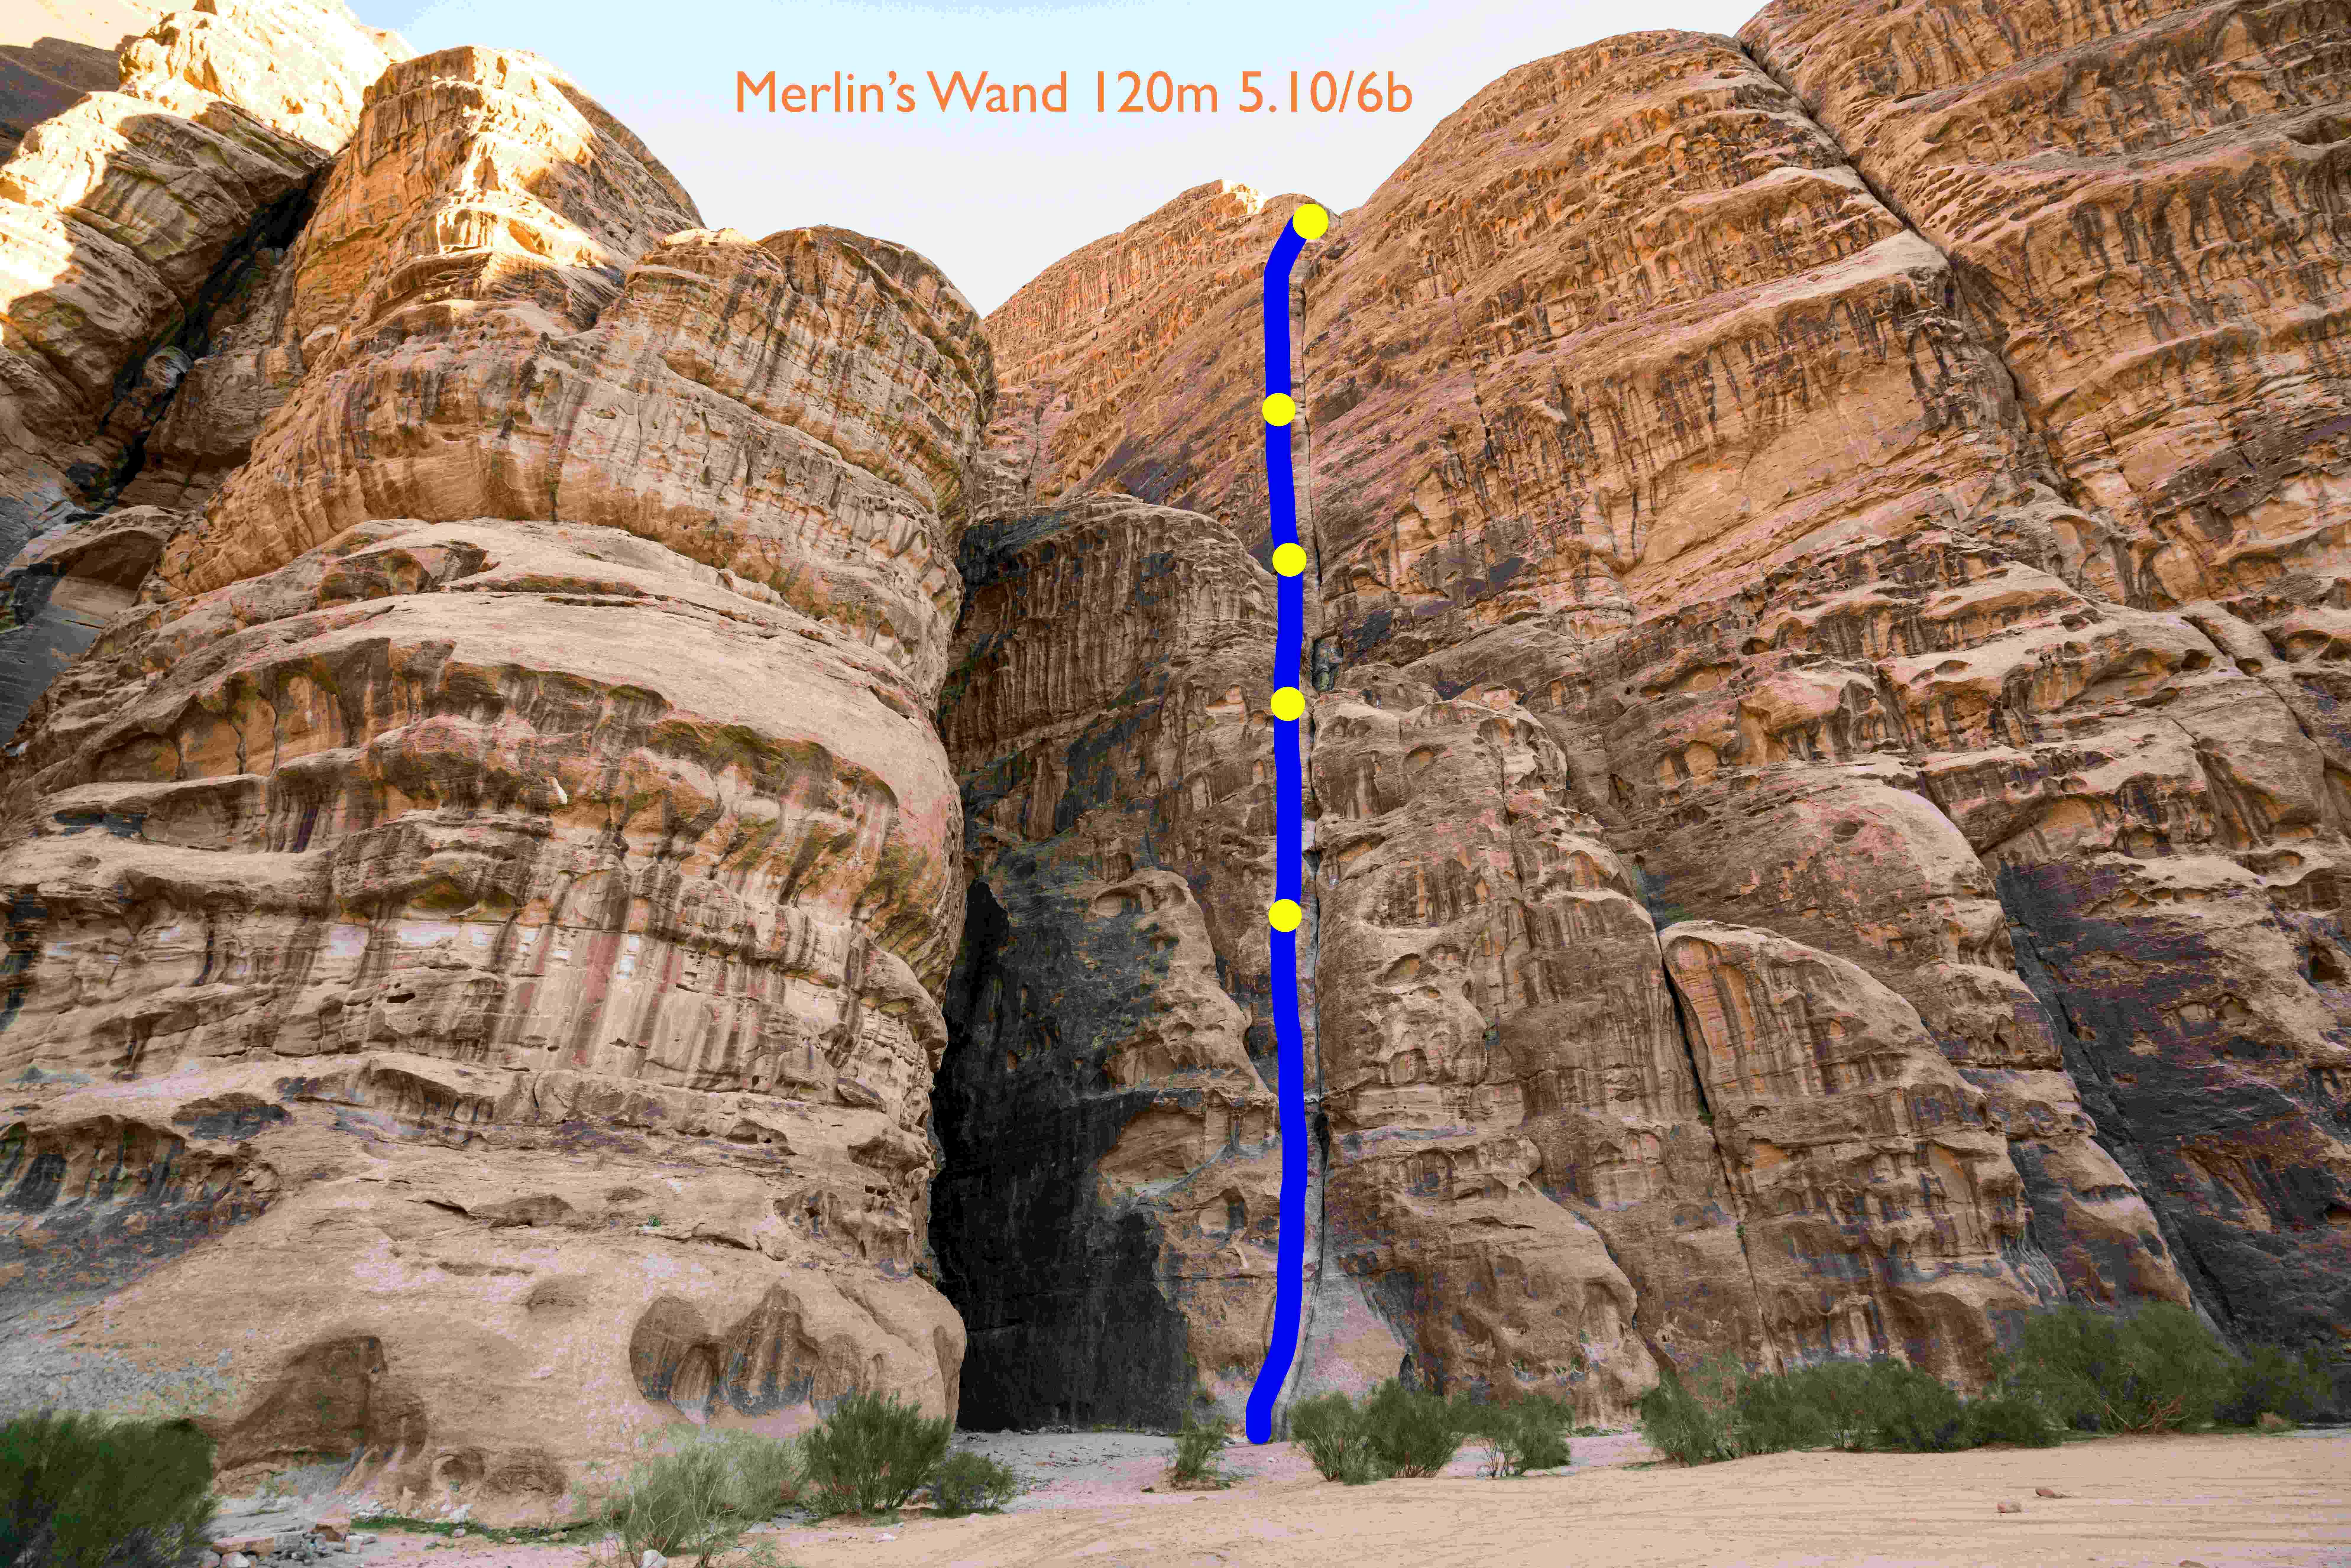 Merlins Wand jordan topo